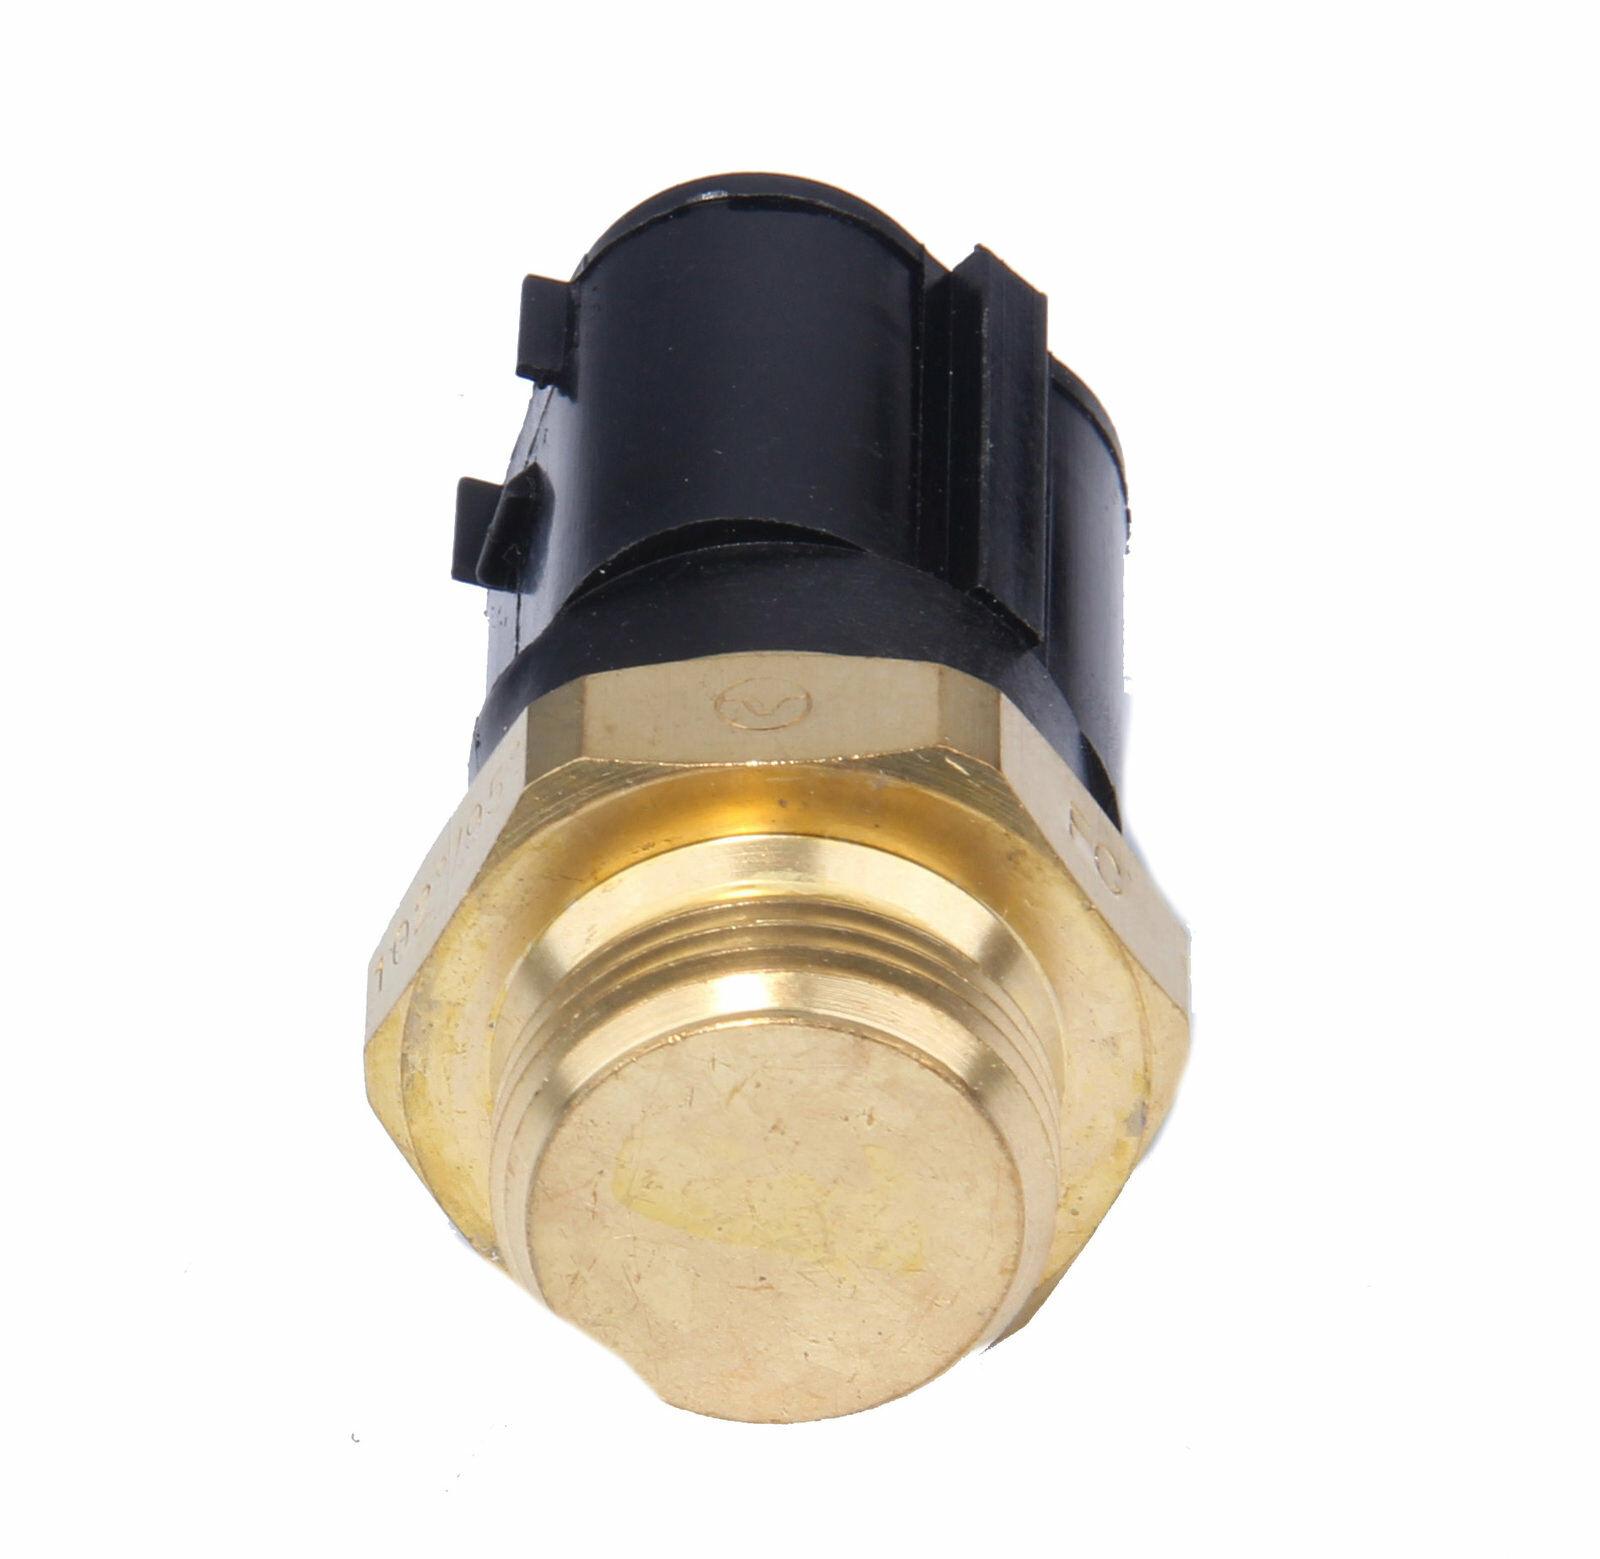 Tuto-remplacement-thermocontact-de-refroidissement-A3-8L-2.jpg